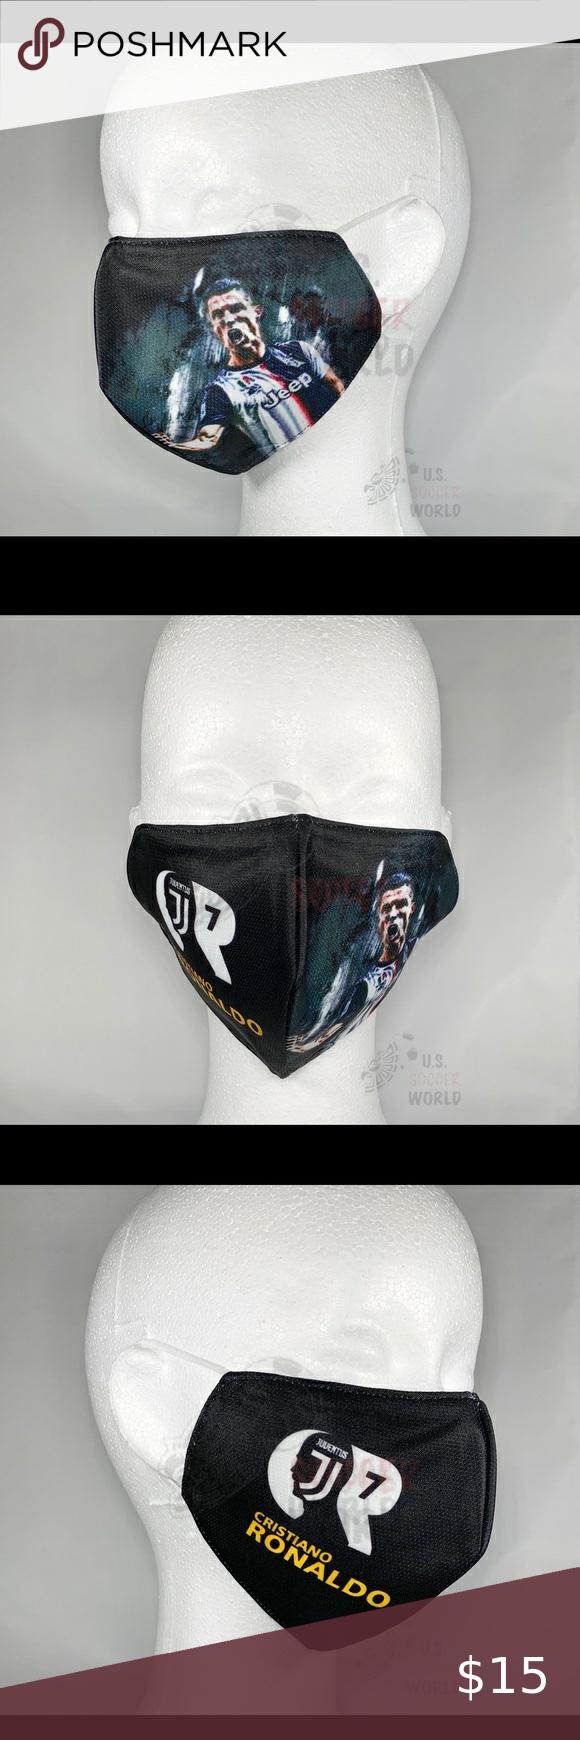 Ronaldo 7 Soccer Face Mask Juventus Cr7 Fashion In 2020 Ronaldo Soccer Guys And Girls